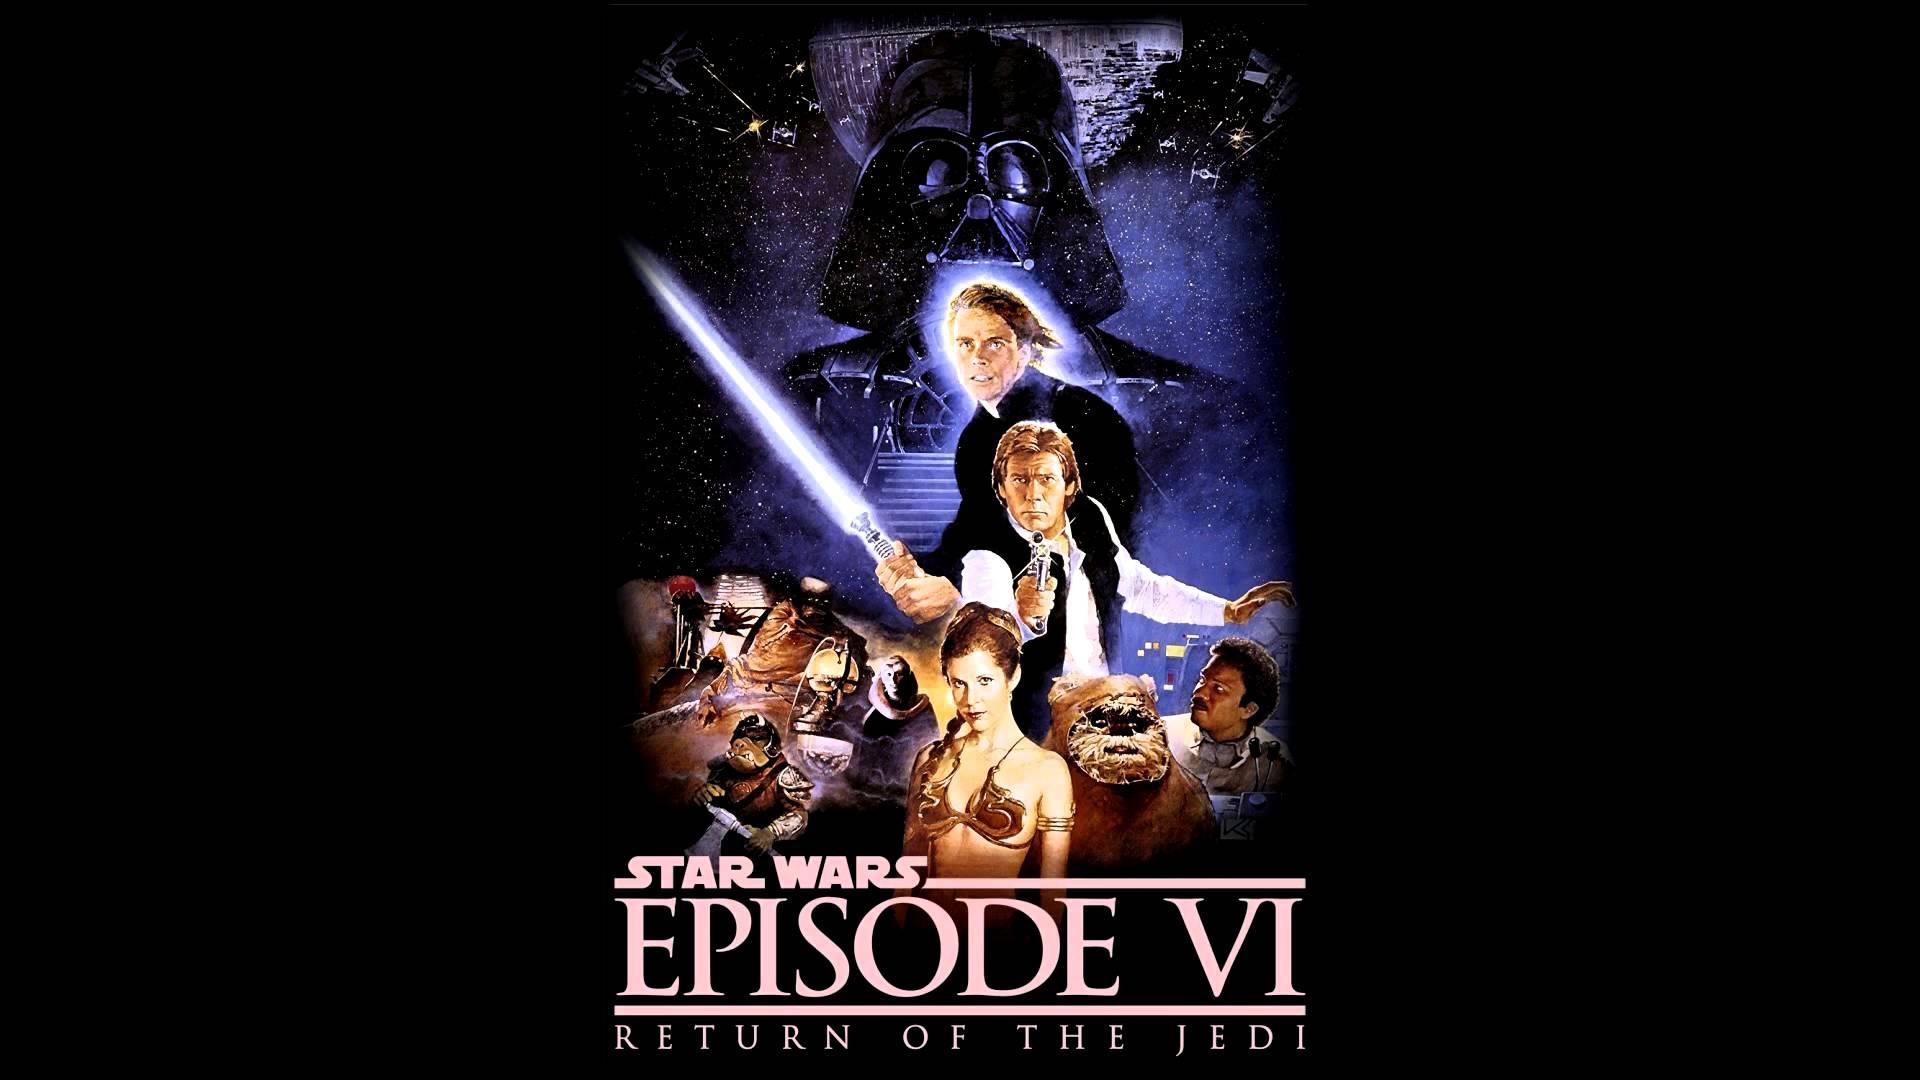 Star Wars Episode VI Return Of The Jedi Wallpaper 6 1920